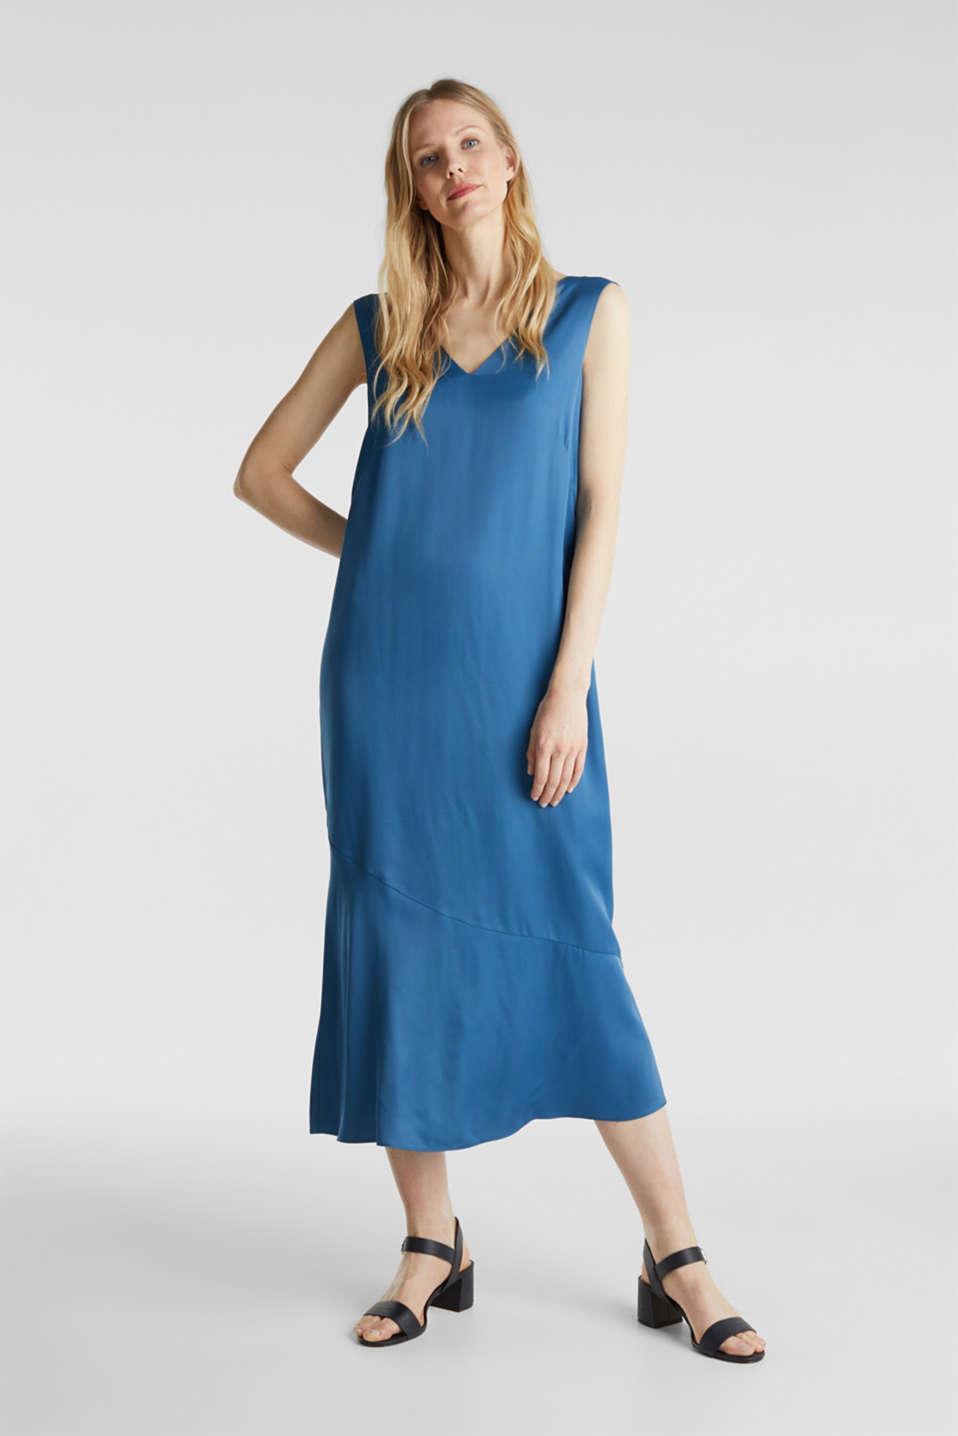 Satin dress with a flounce hem, PETROL BLUE, detail image number 1